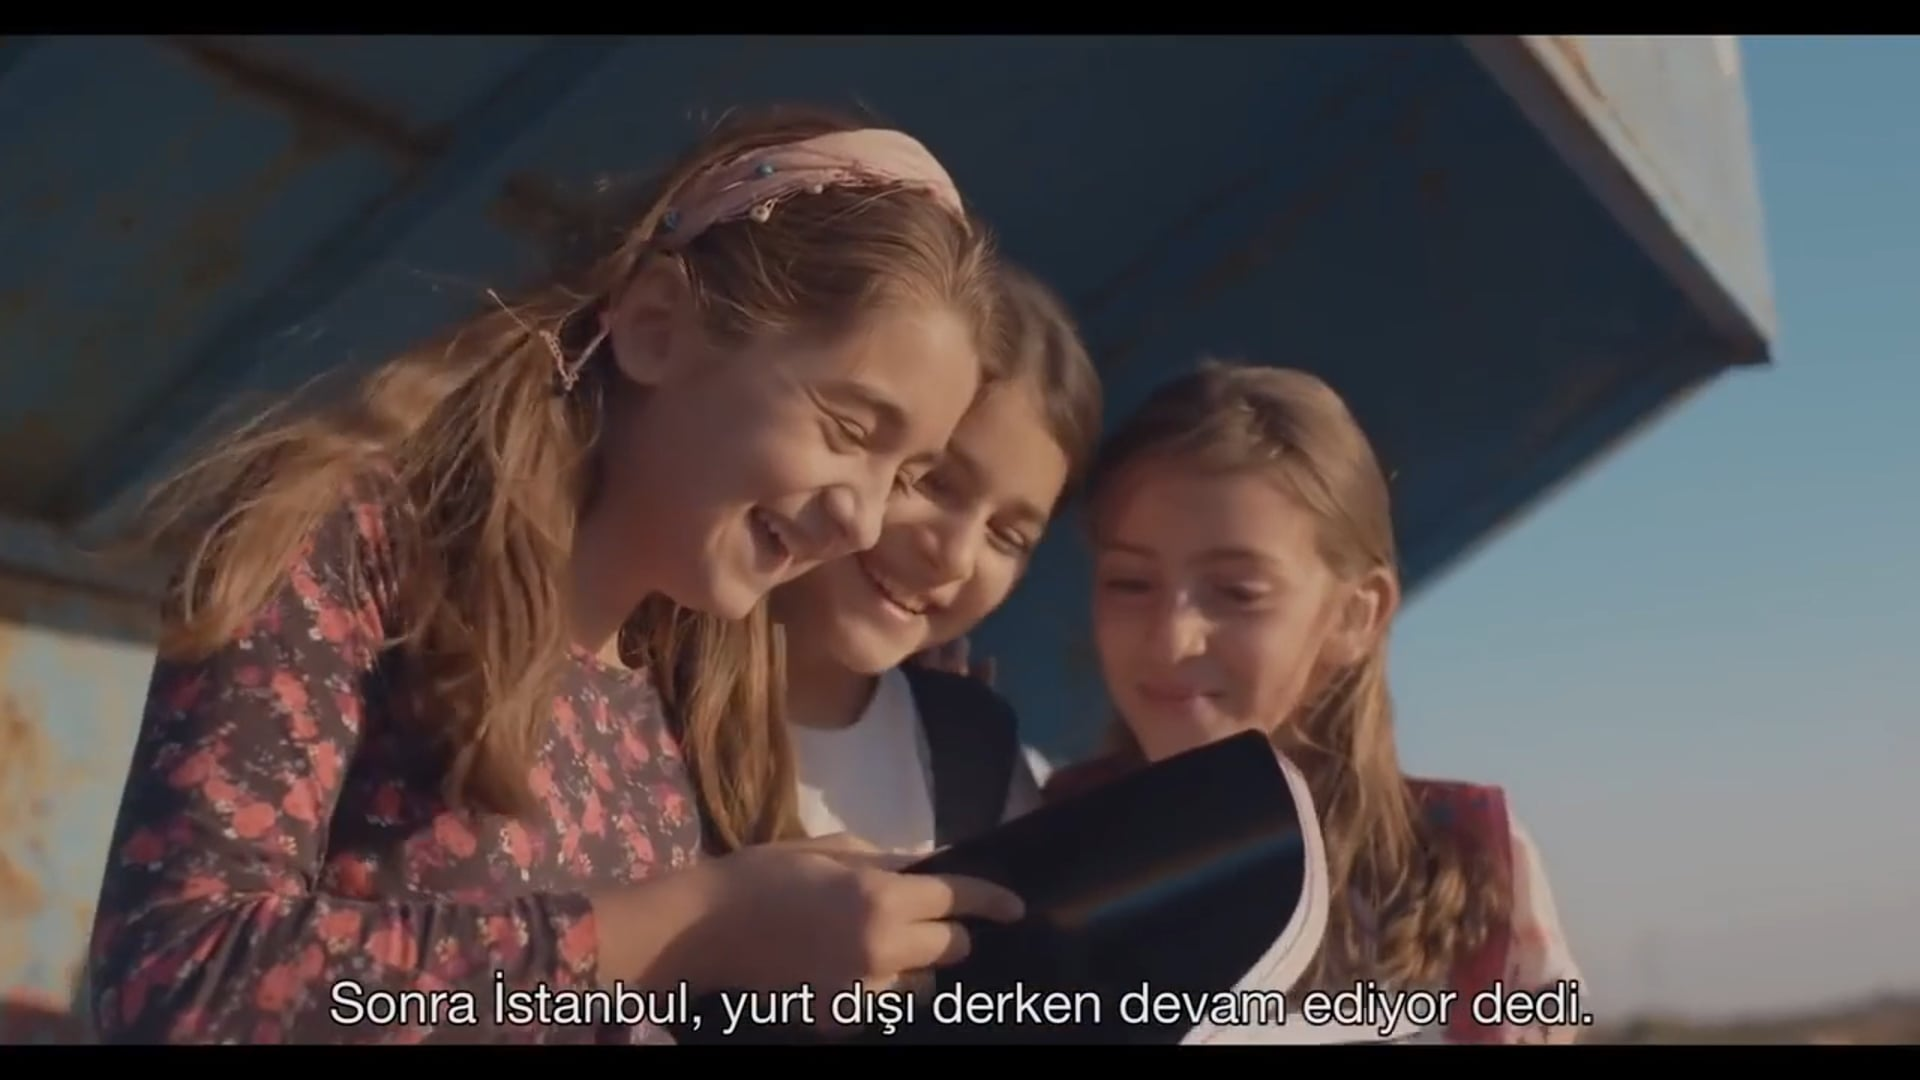 Director: Sinem Cezayirlir-TURKCELL - SİVRİCE DREAM